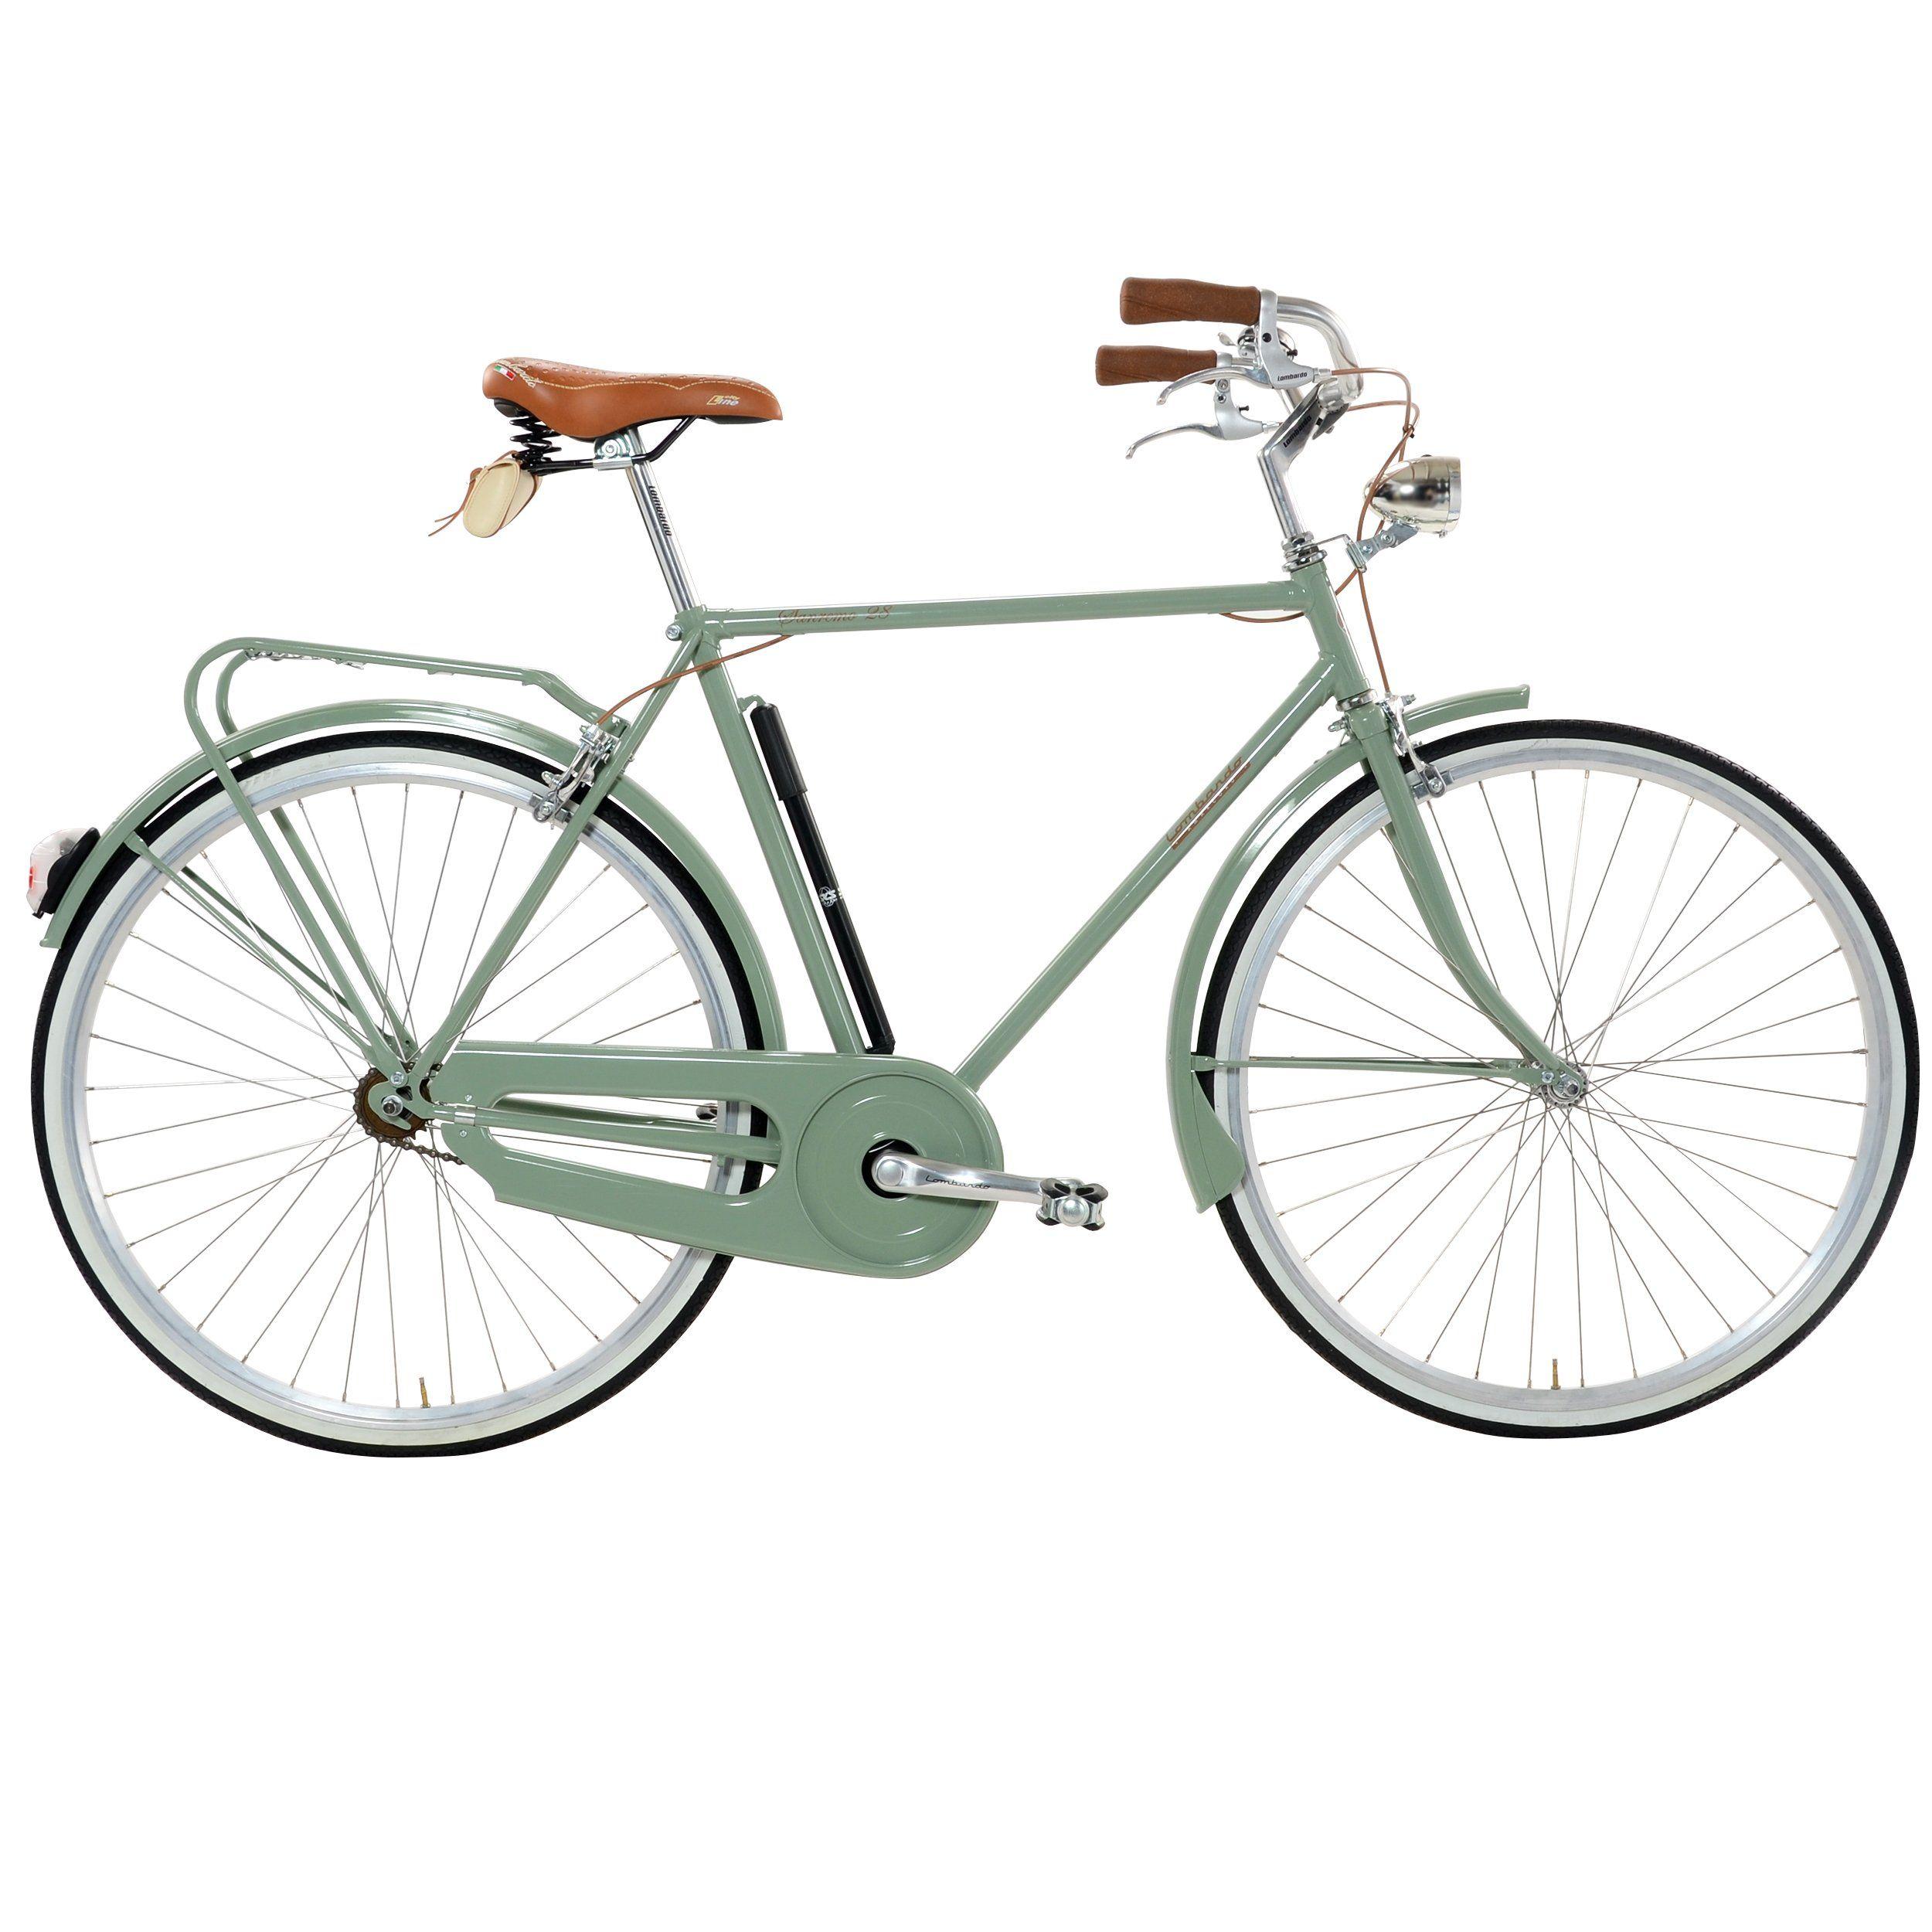 Lombardo Sanremo M City Bike Military Green 22 Inch One Size 99